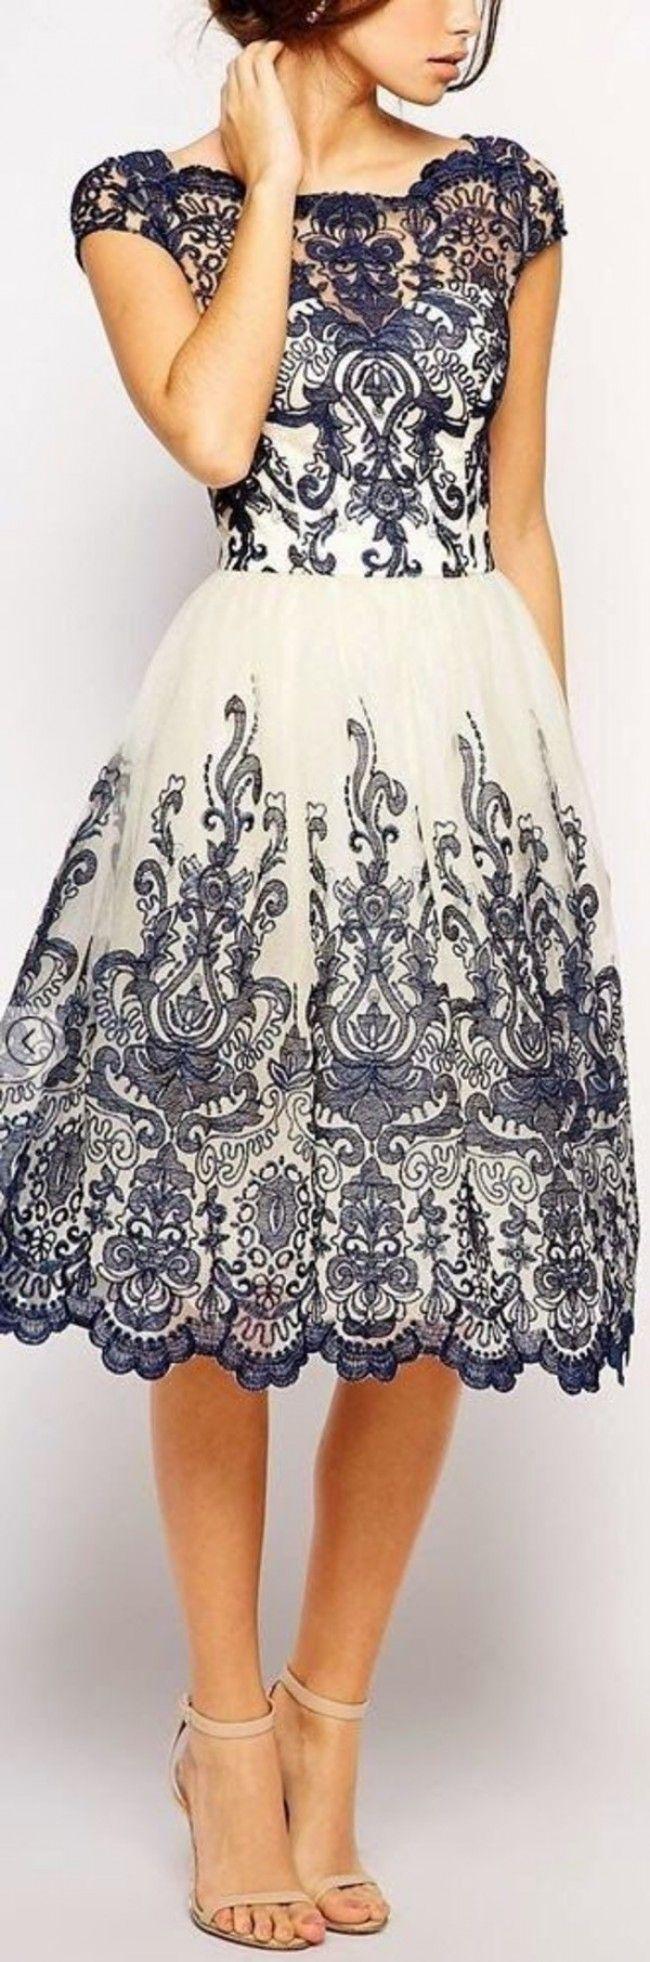 Line lace short prom dresses, homecoming dress, bridesmaid dress